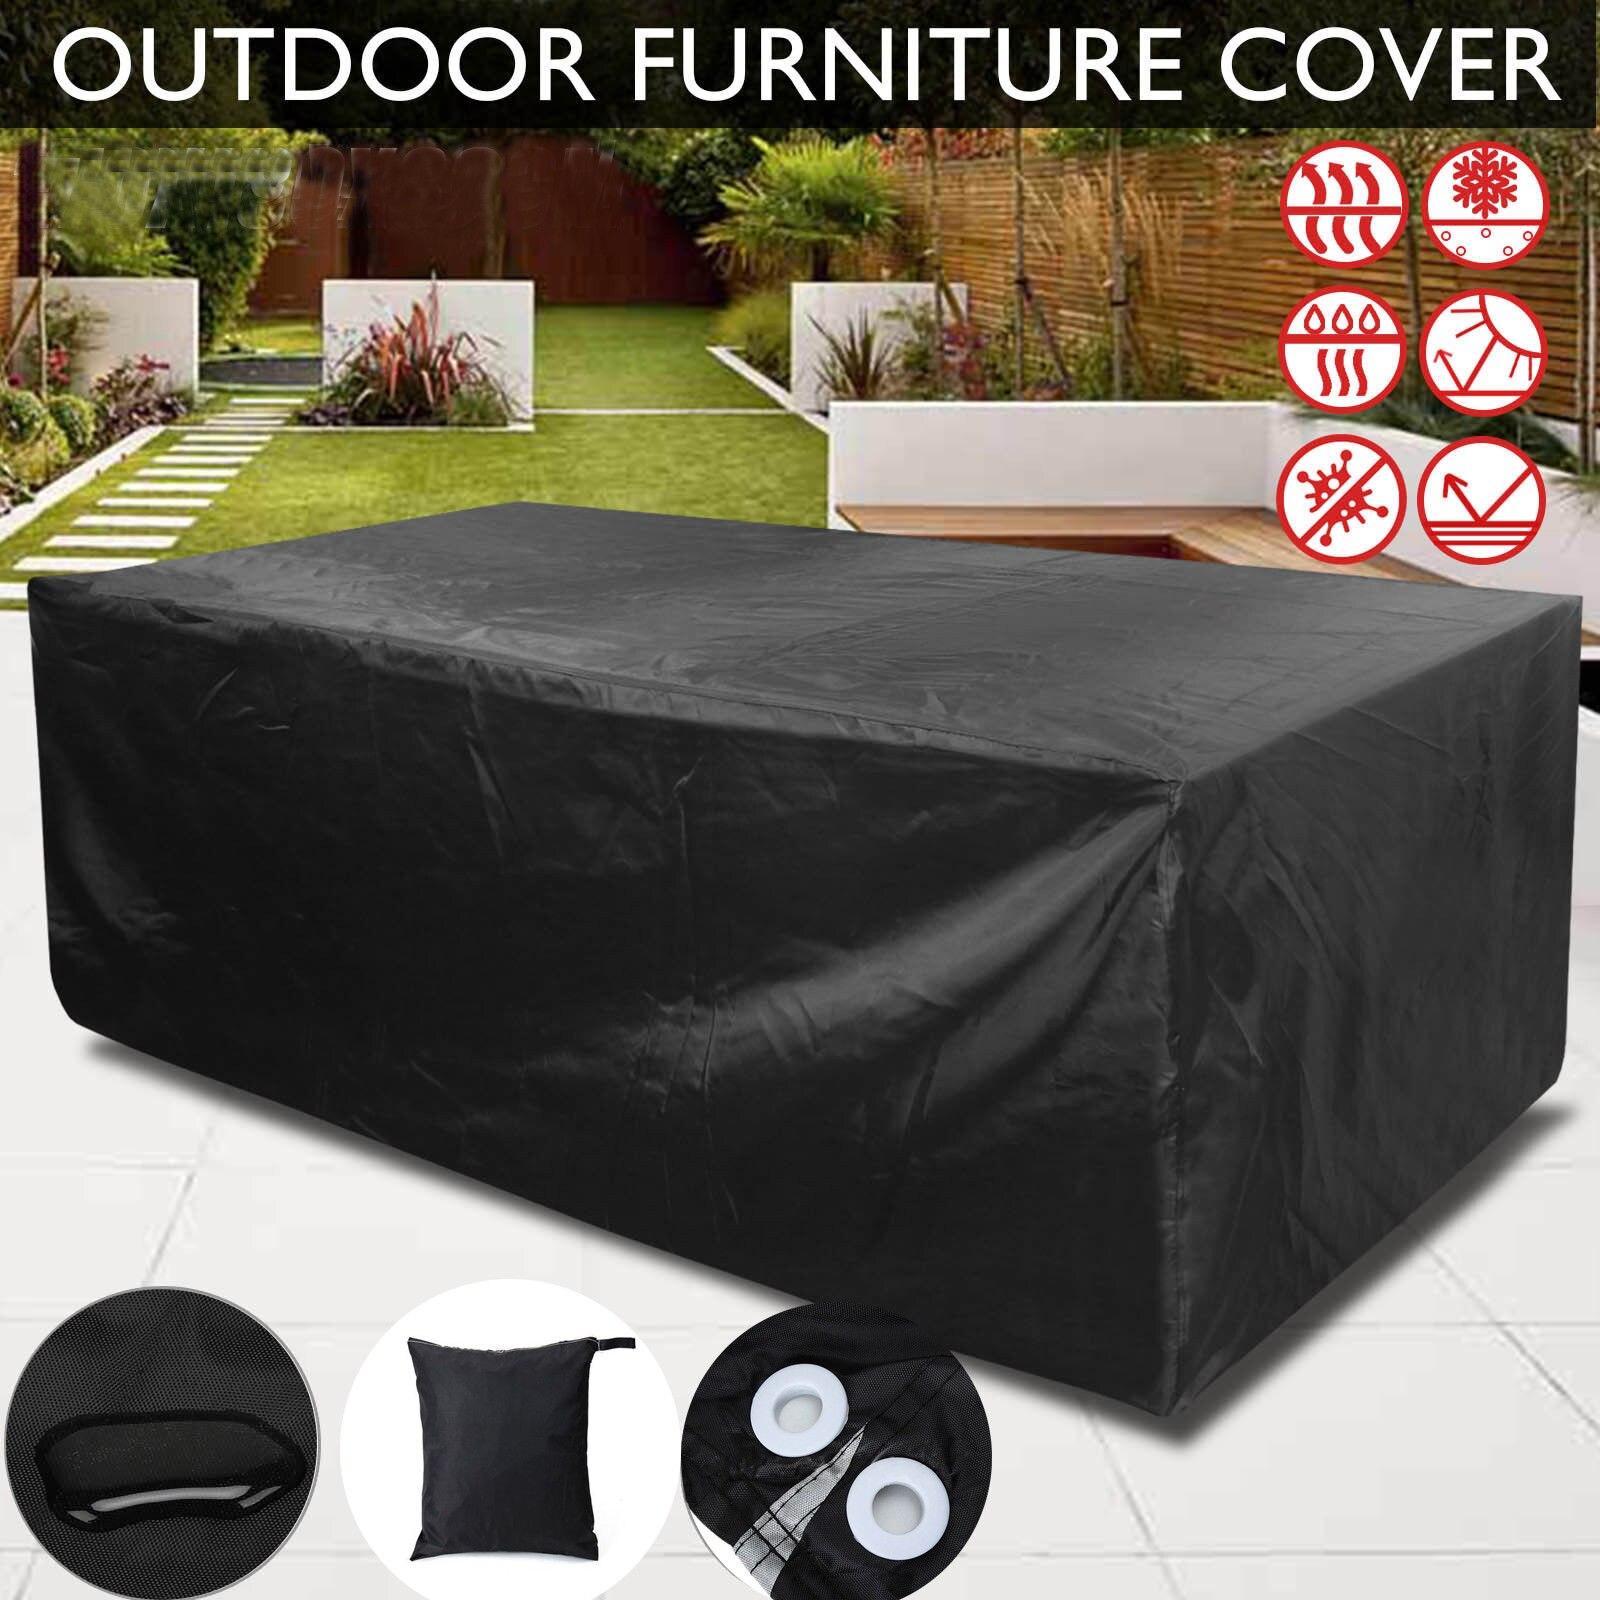 6 Size Outdoor Furniture Cover Patio Garden Table Chair Shelter Sun